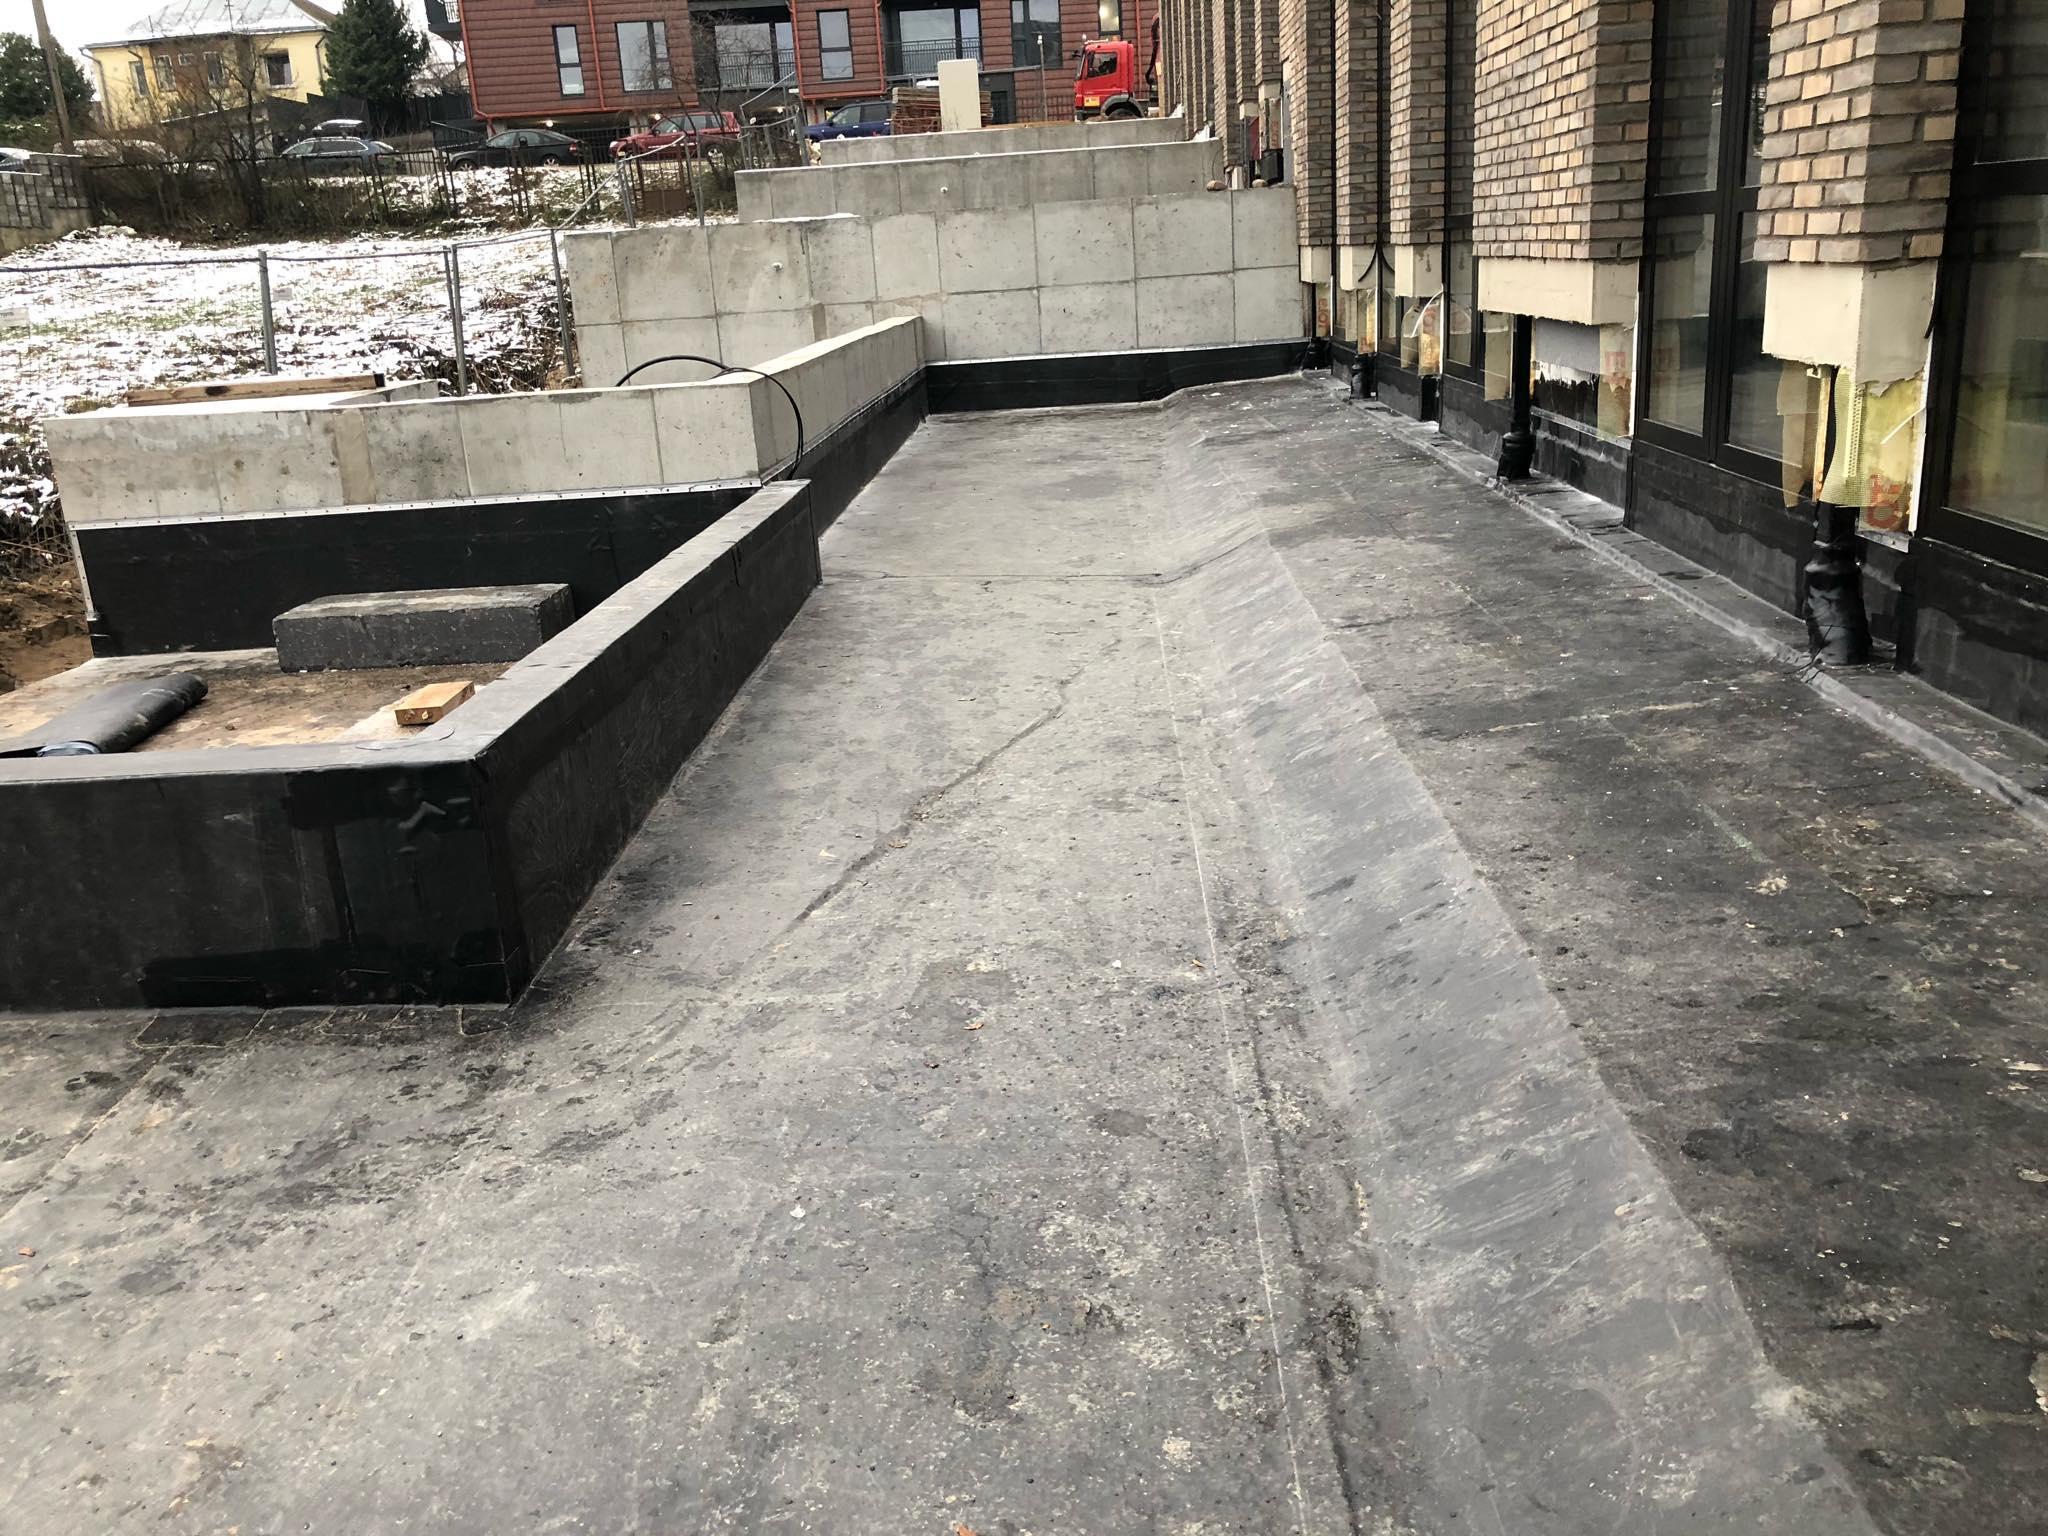 Požeminio parkingo/terasos hidroizoliacija, Vilnius - 2020 m.